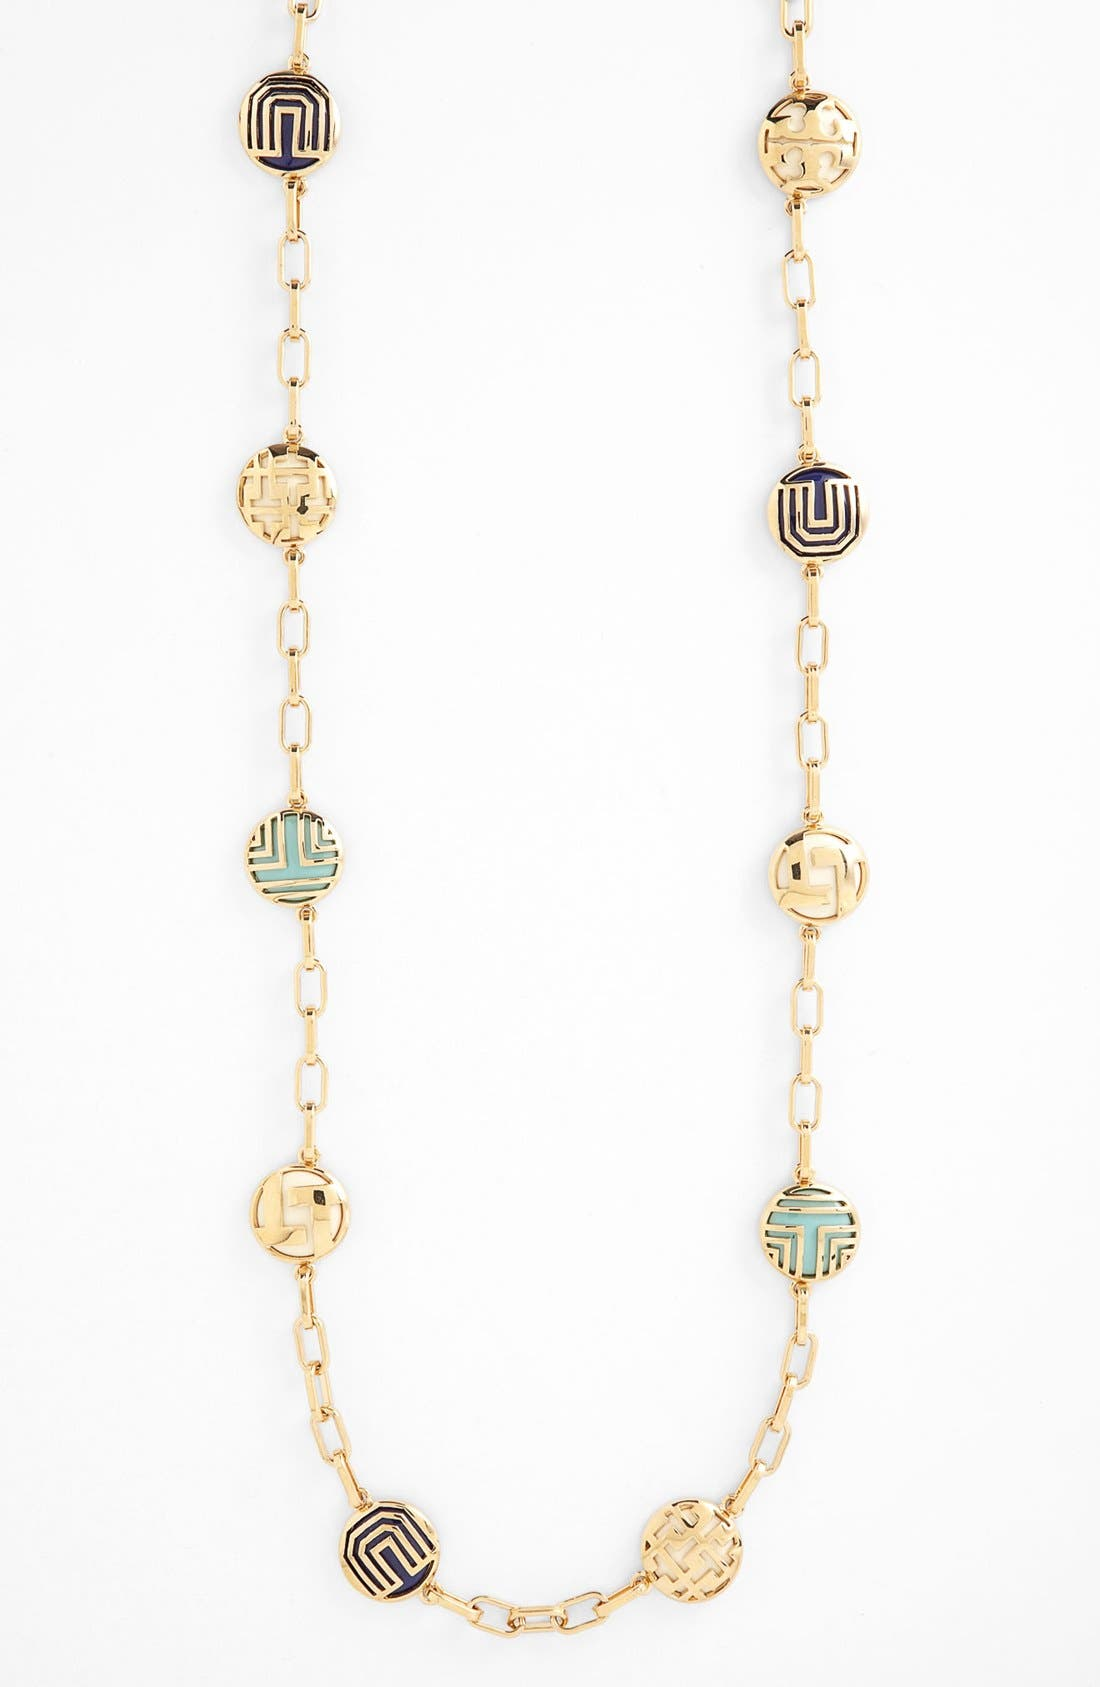 Main Image - Tory Burch 'Color Frete' Long Station Necklace